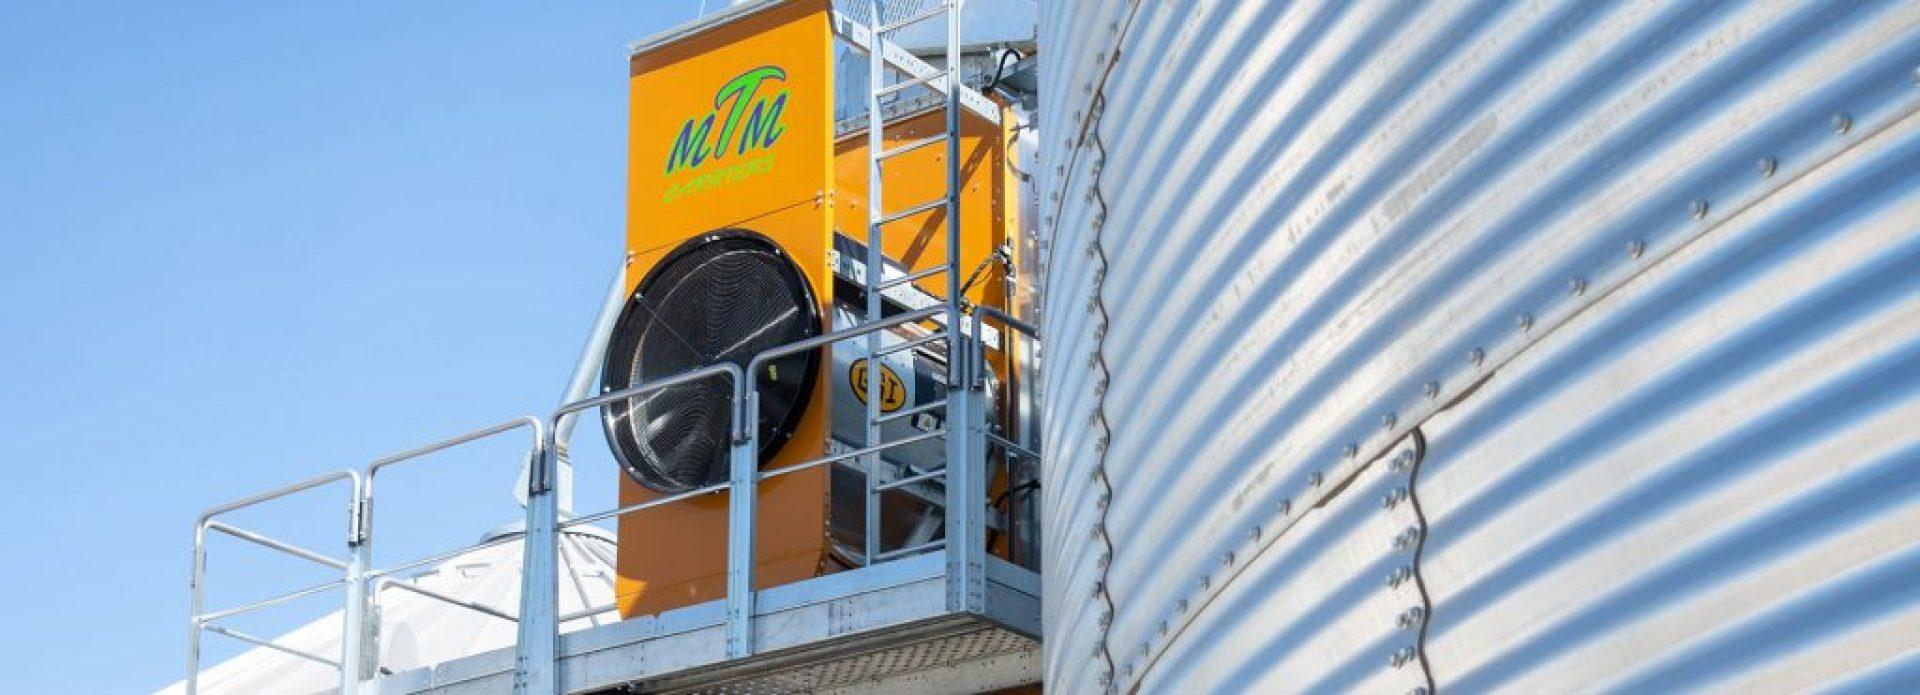 Eldon-C-Stutsman-Inc-Grain-Handling (3)